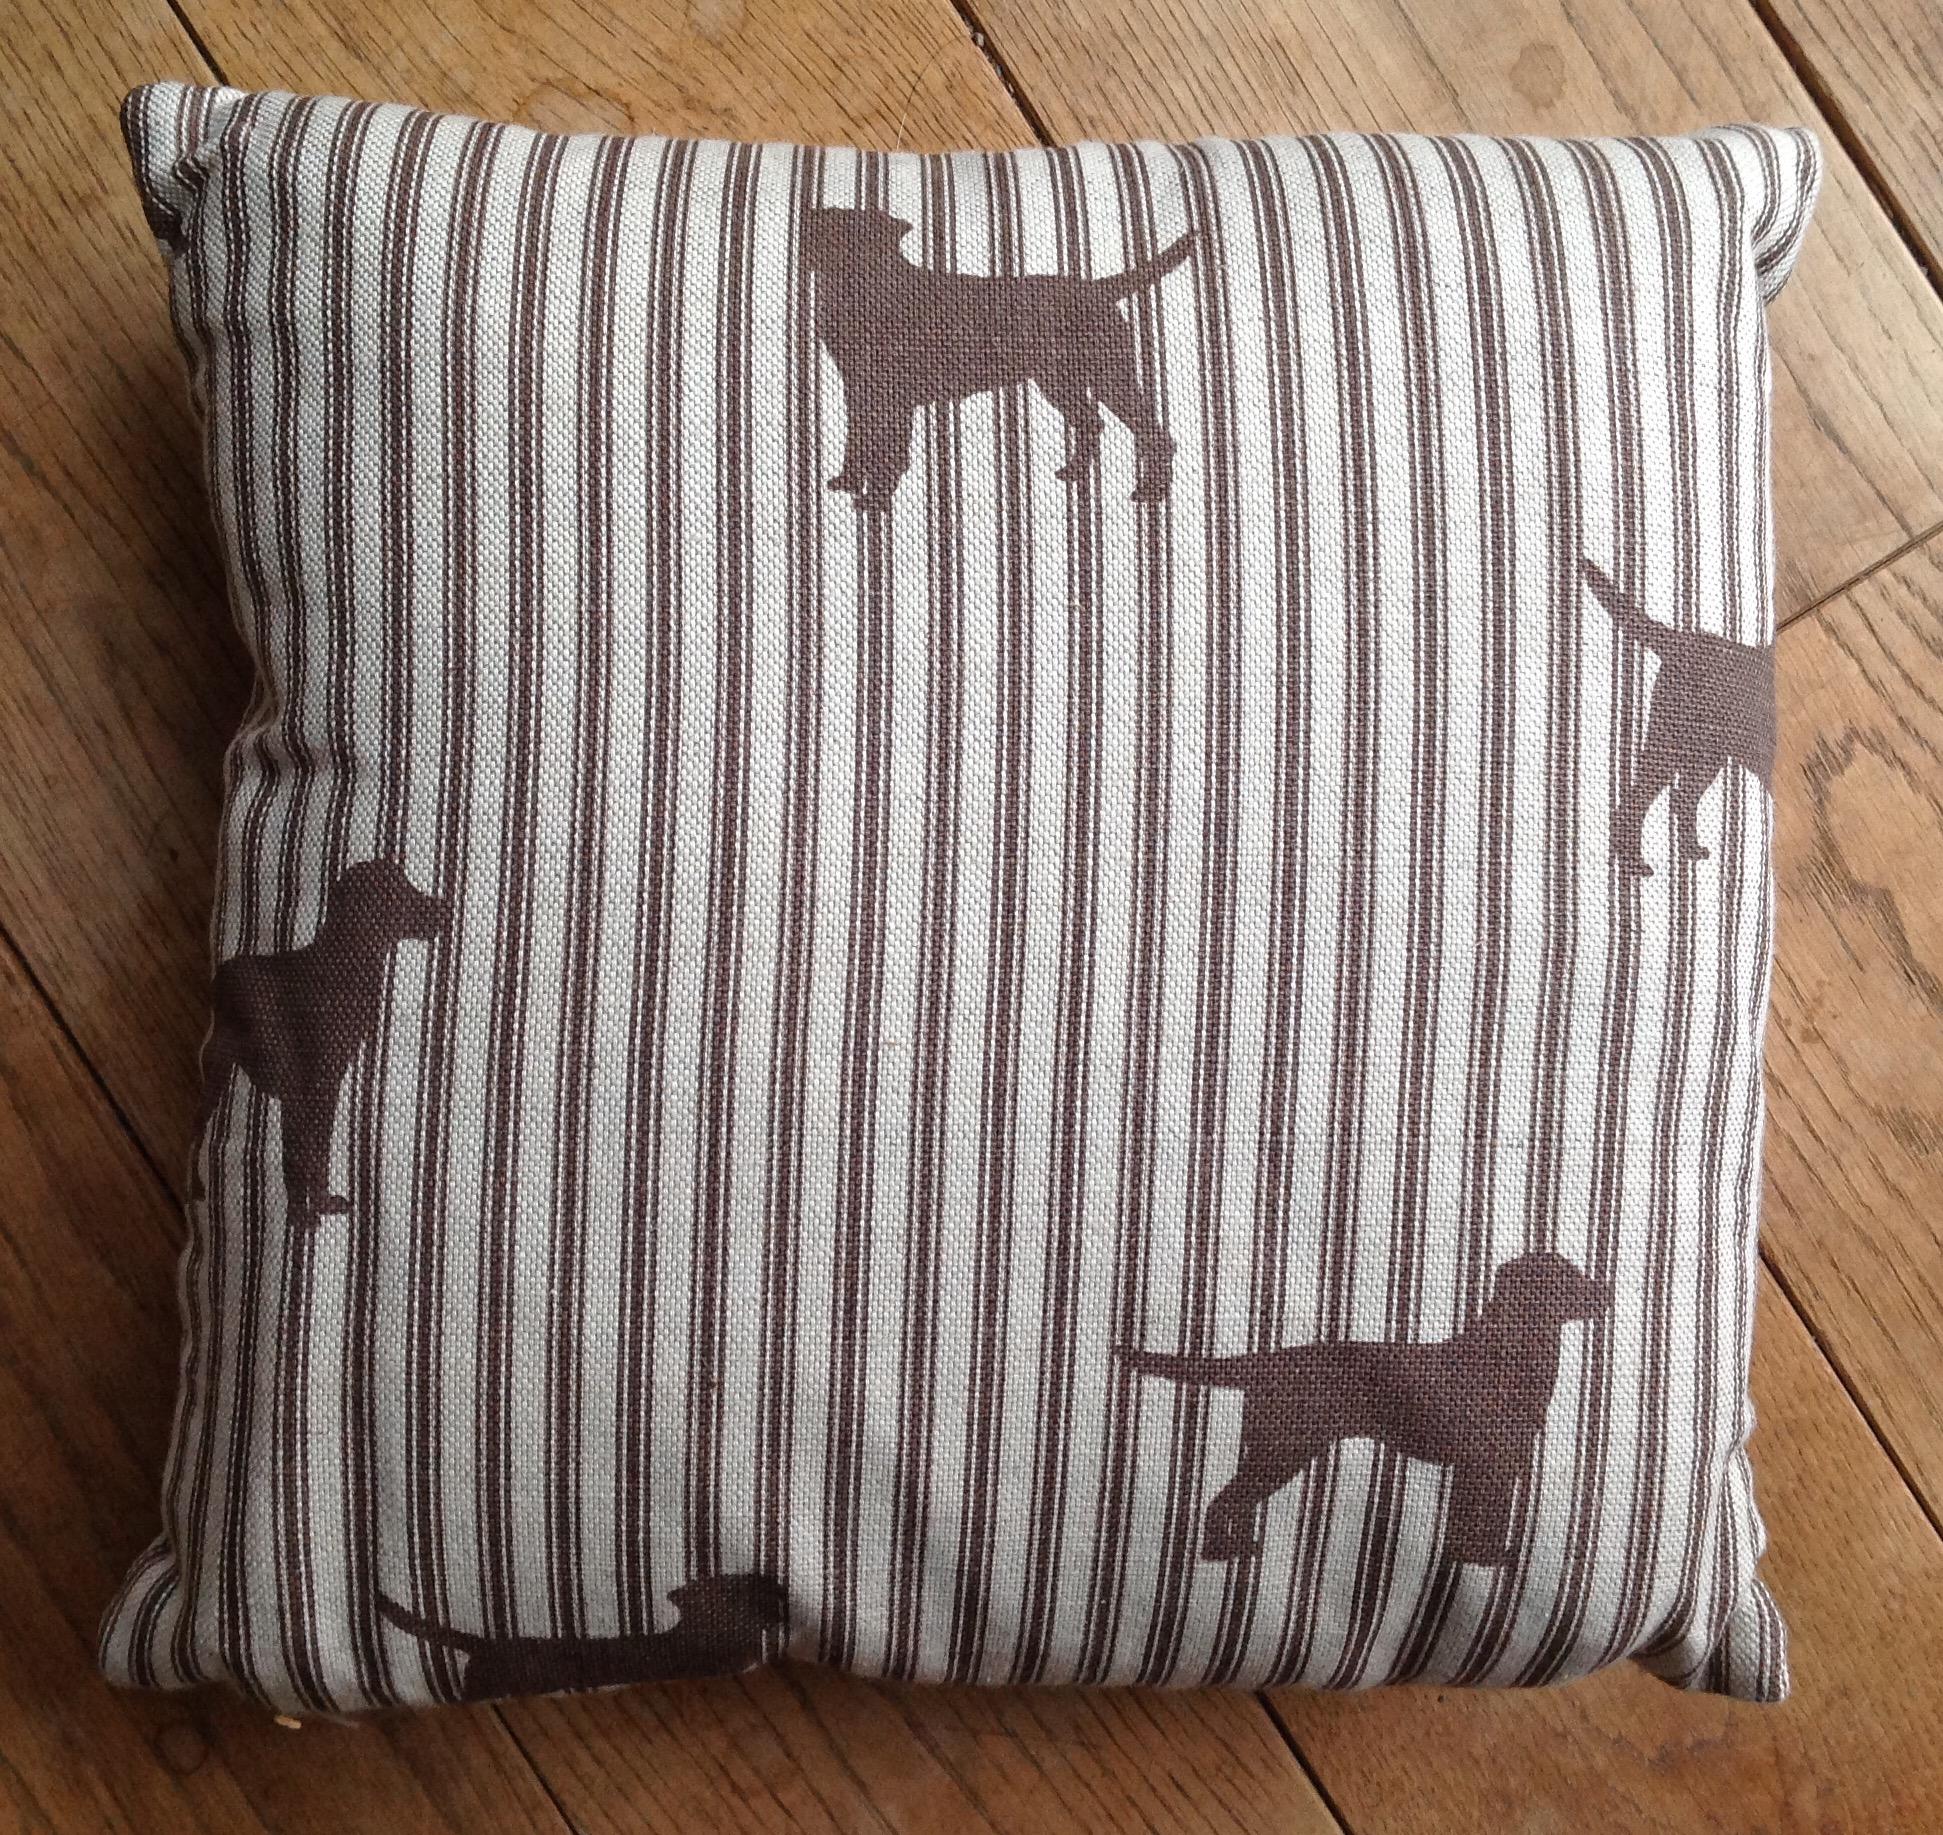 "Cushion cover -12"" Chocolate labradors on ticking stripe"